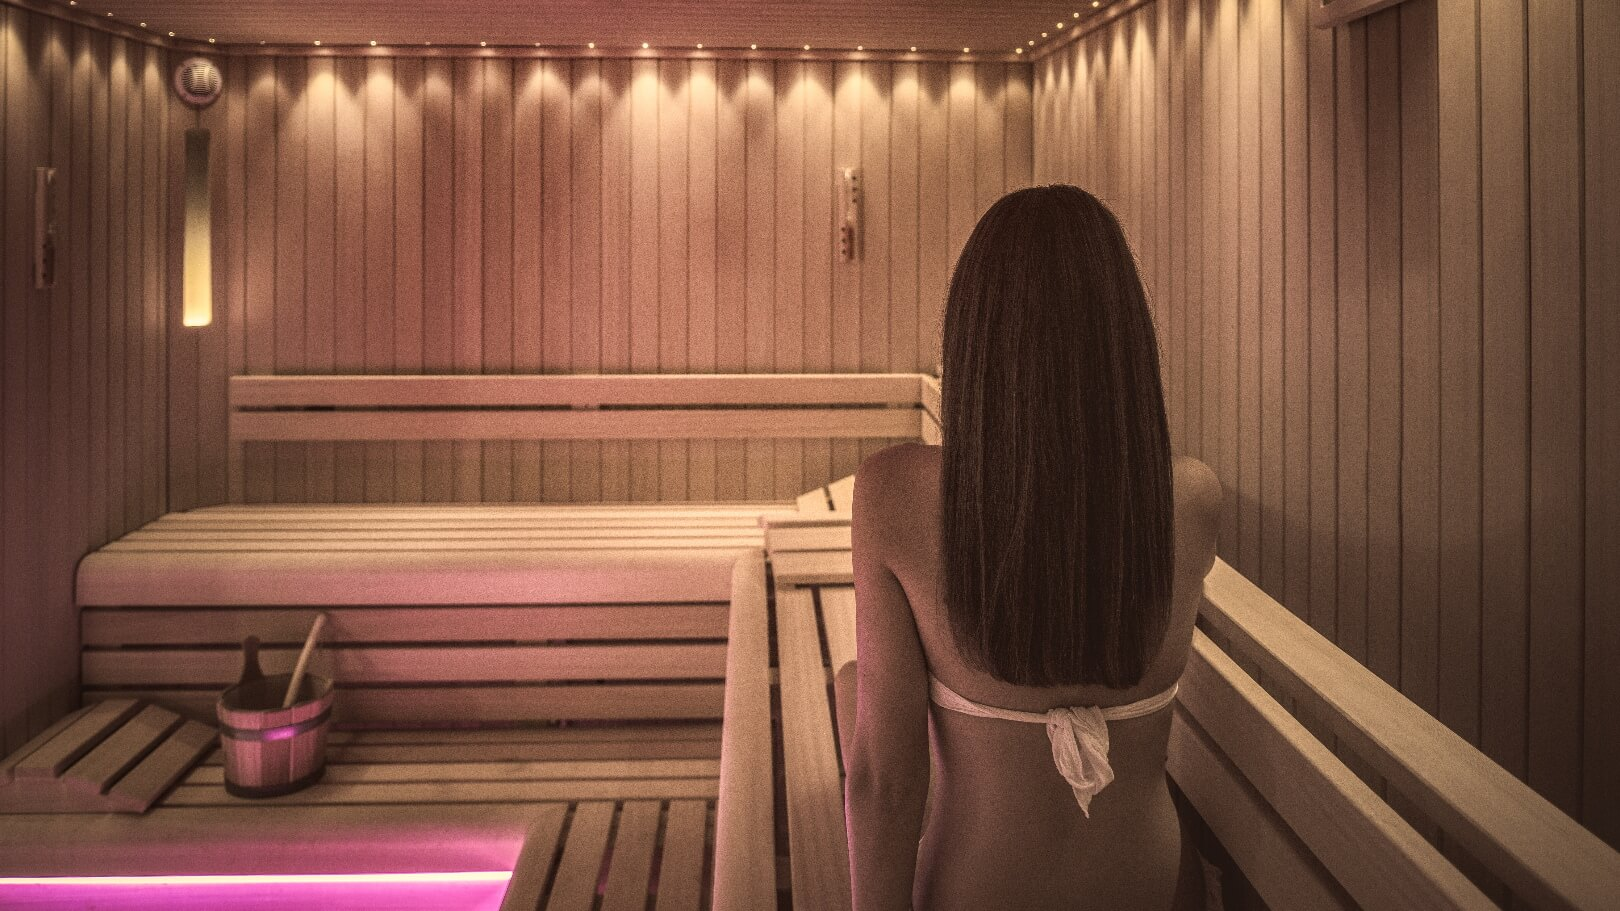 https://www.chialagunaresort.com/wp-content/uploads/2021/05/IHC_Chia-Laguna-Resort_grid_CL4U_sauna.jpg